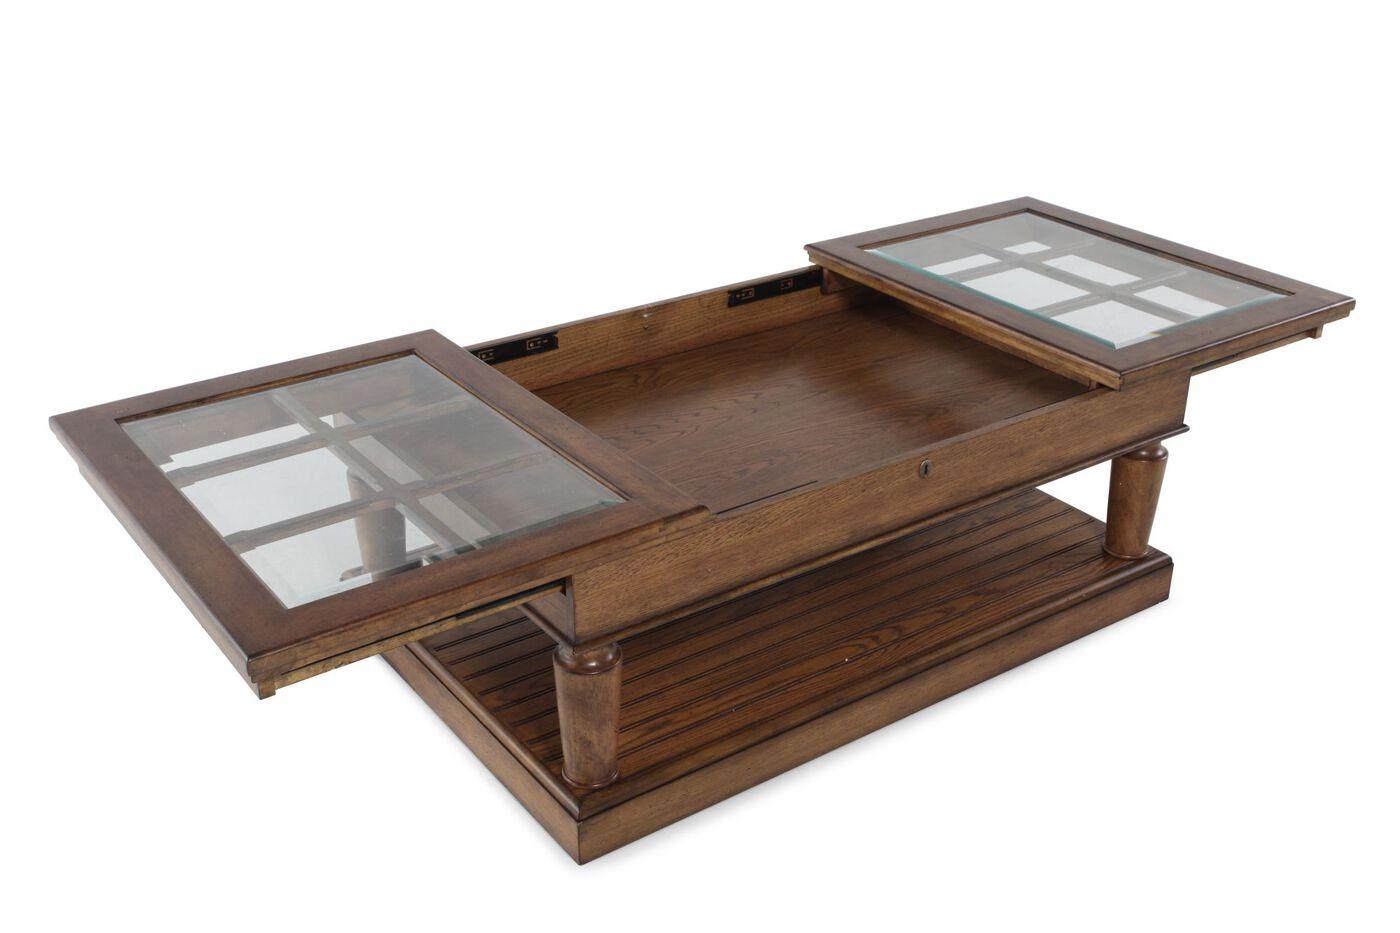 ... Broyhill New Vintage Window Pane Coffee Table ... - Broyhill New Vintage Window Pane Coffee Table Mathis Brothers